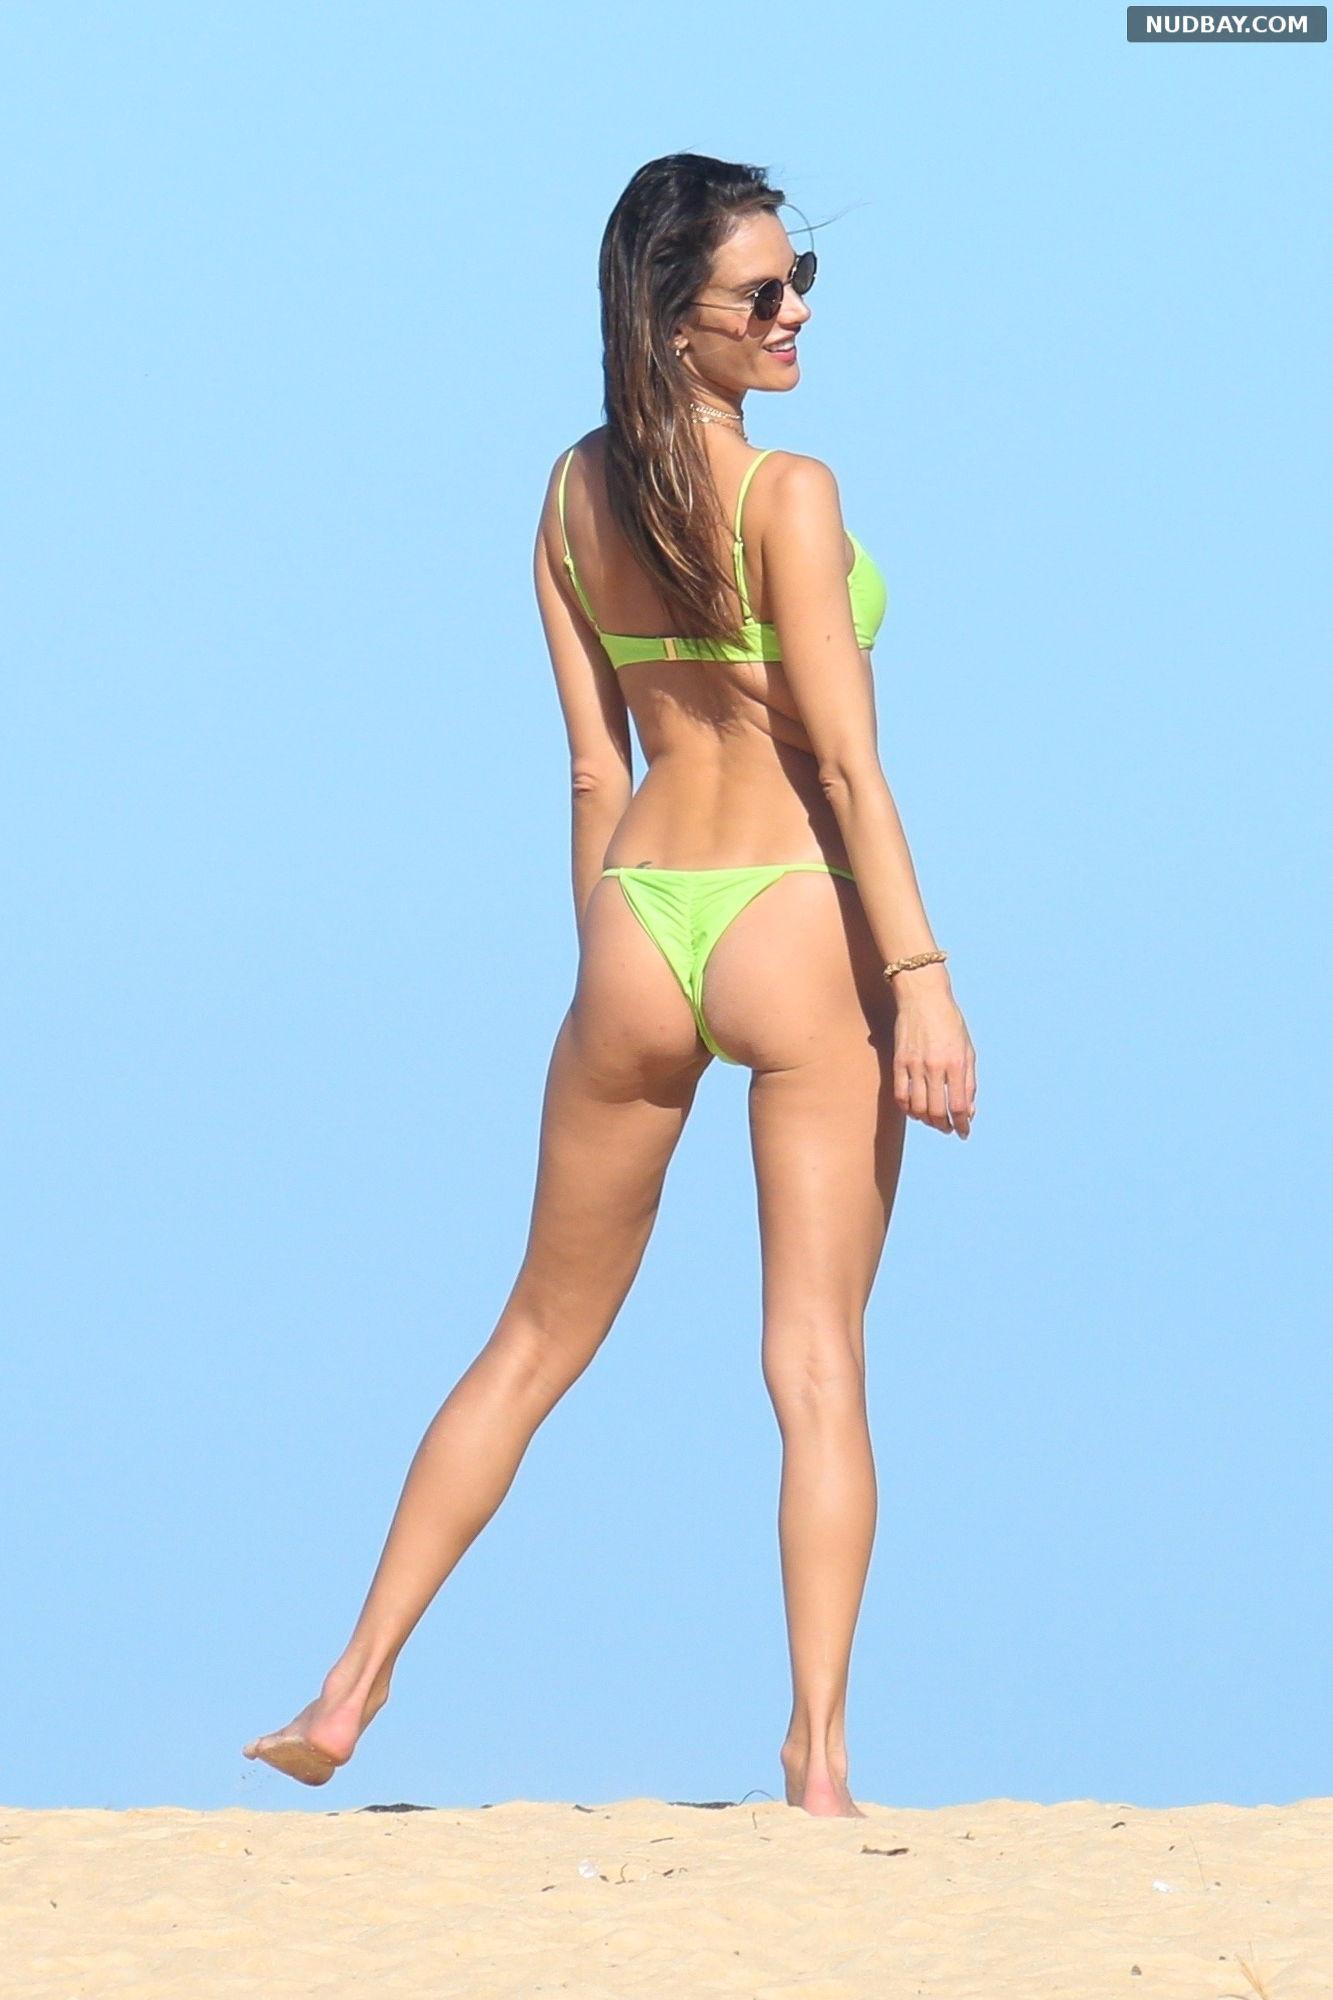 Alessandra Ambrosio Nude Ass at the beach in Trancoso Jul 30 2021